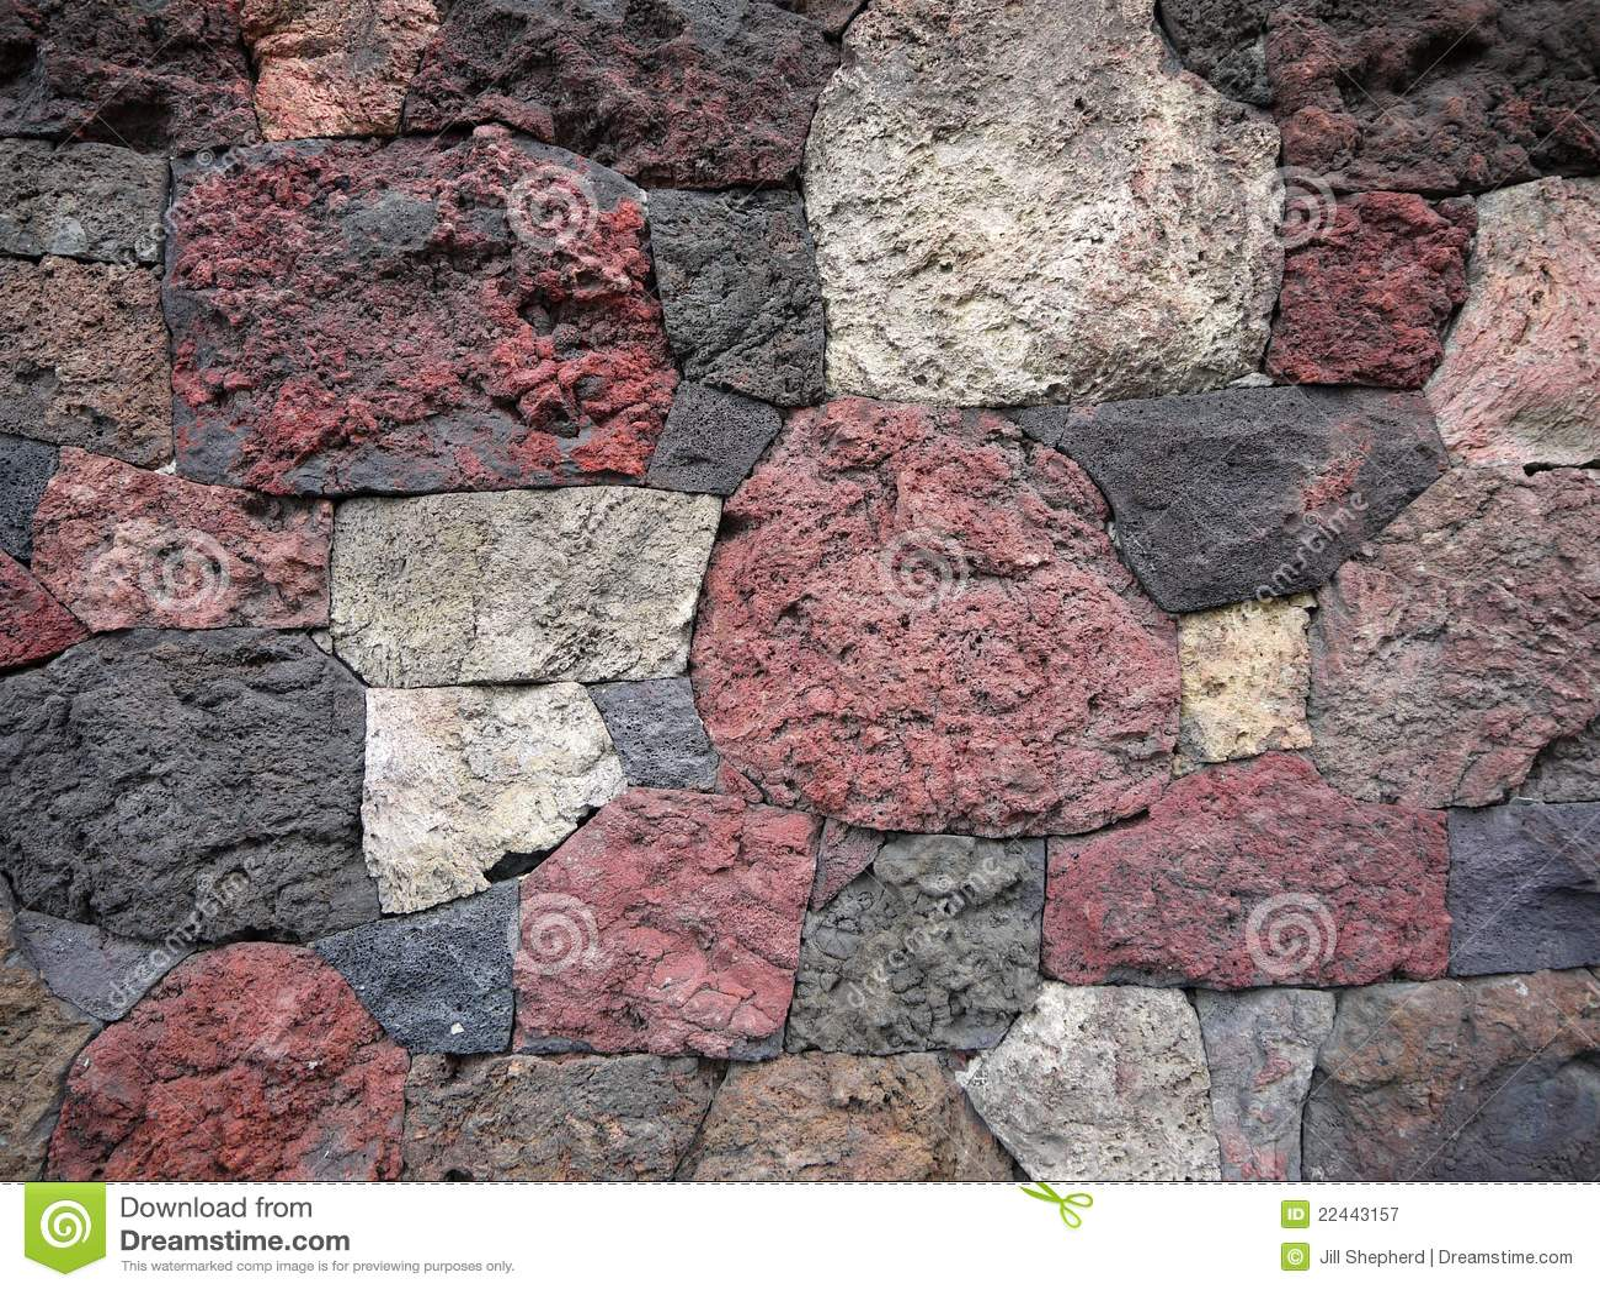 Garden scoria lava rock wall royalty free stock for Landscaping rocks auckland